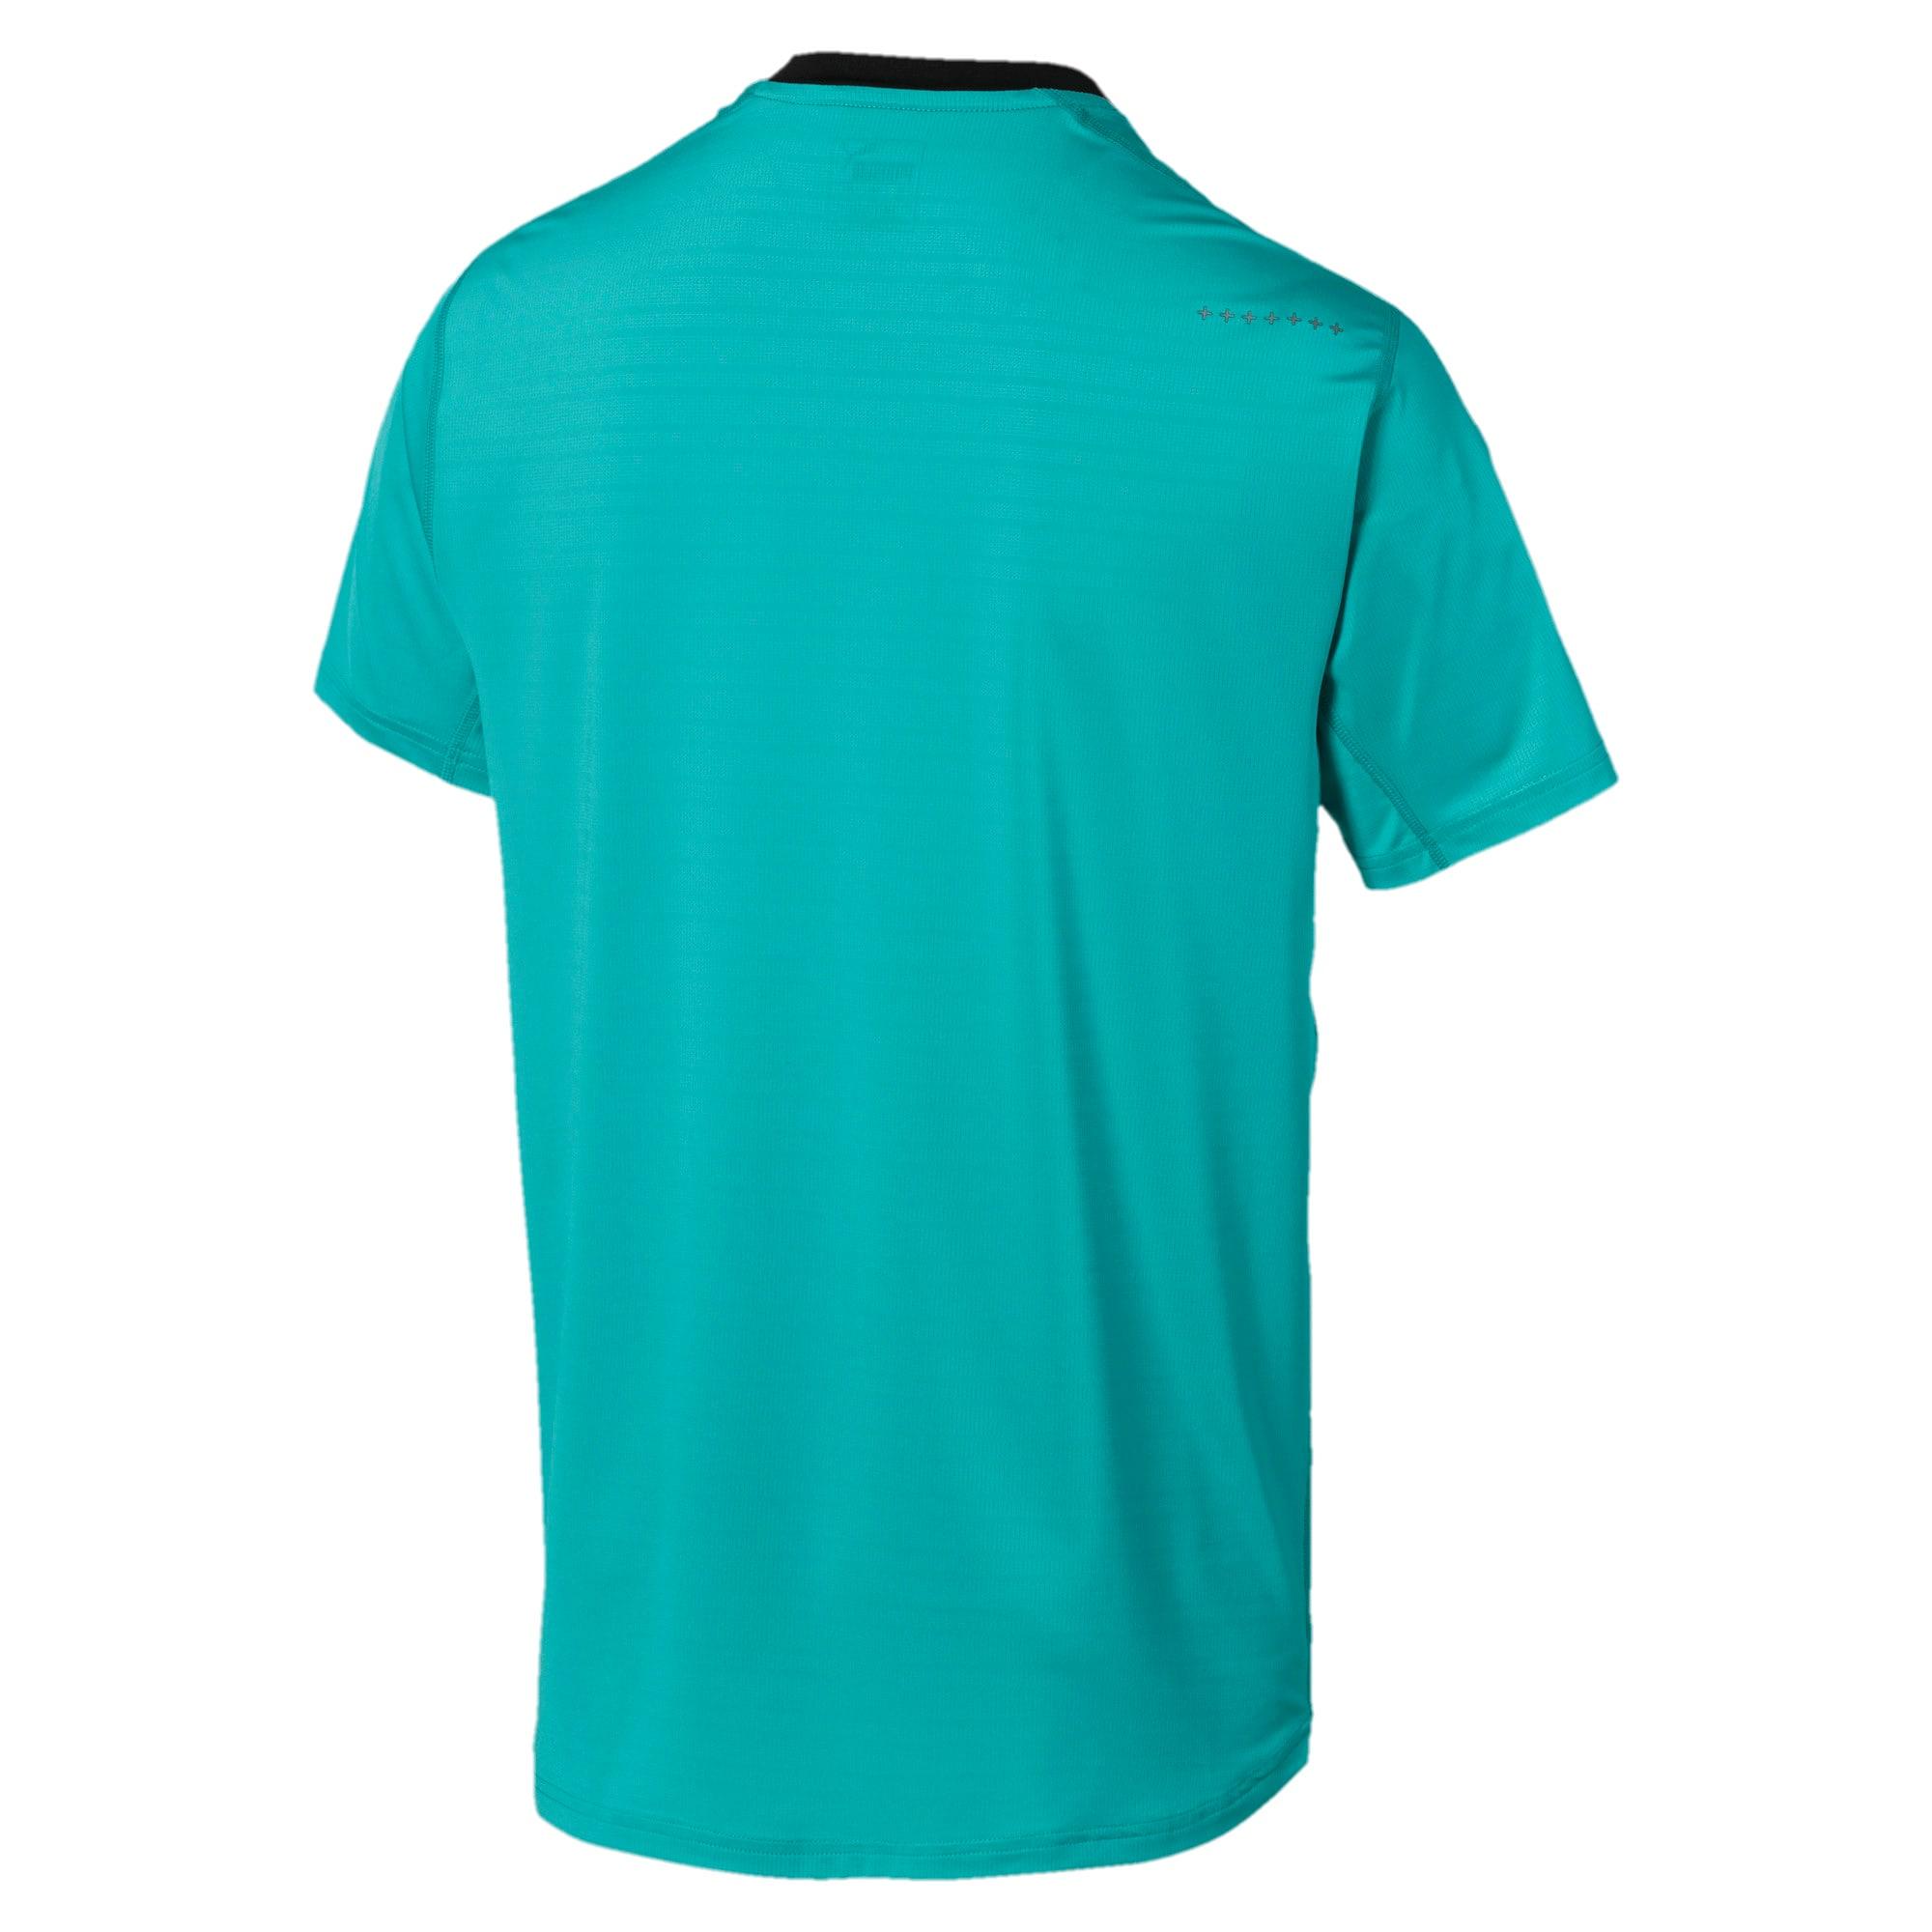 Thumbnail 5 of Get Fast Excite hardloopshirt voor heren, Blue Turquoise-Puma Black, medium